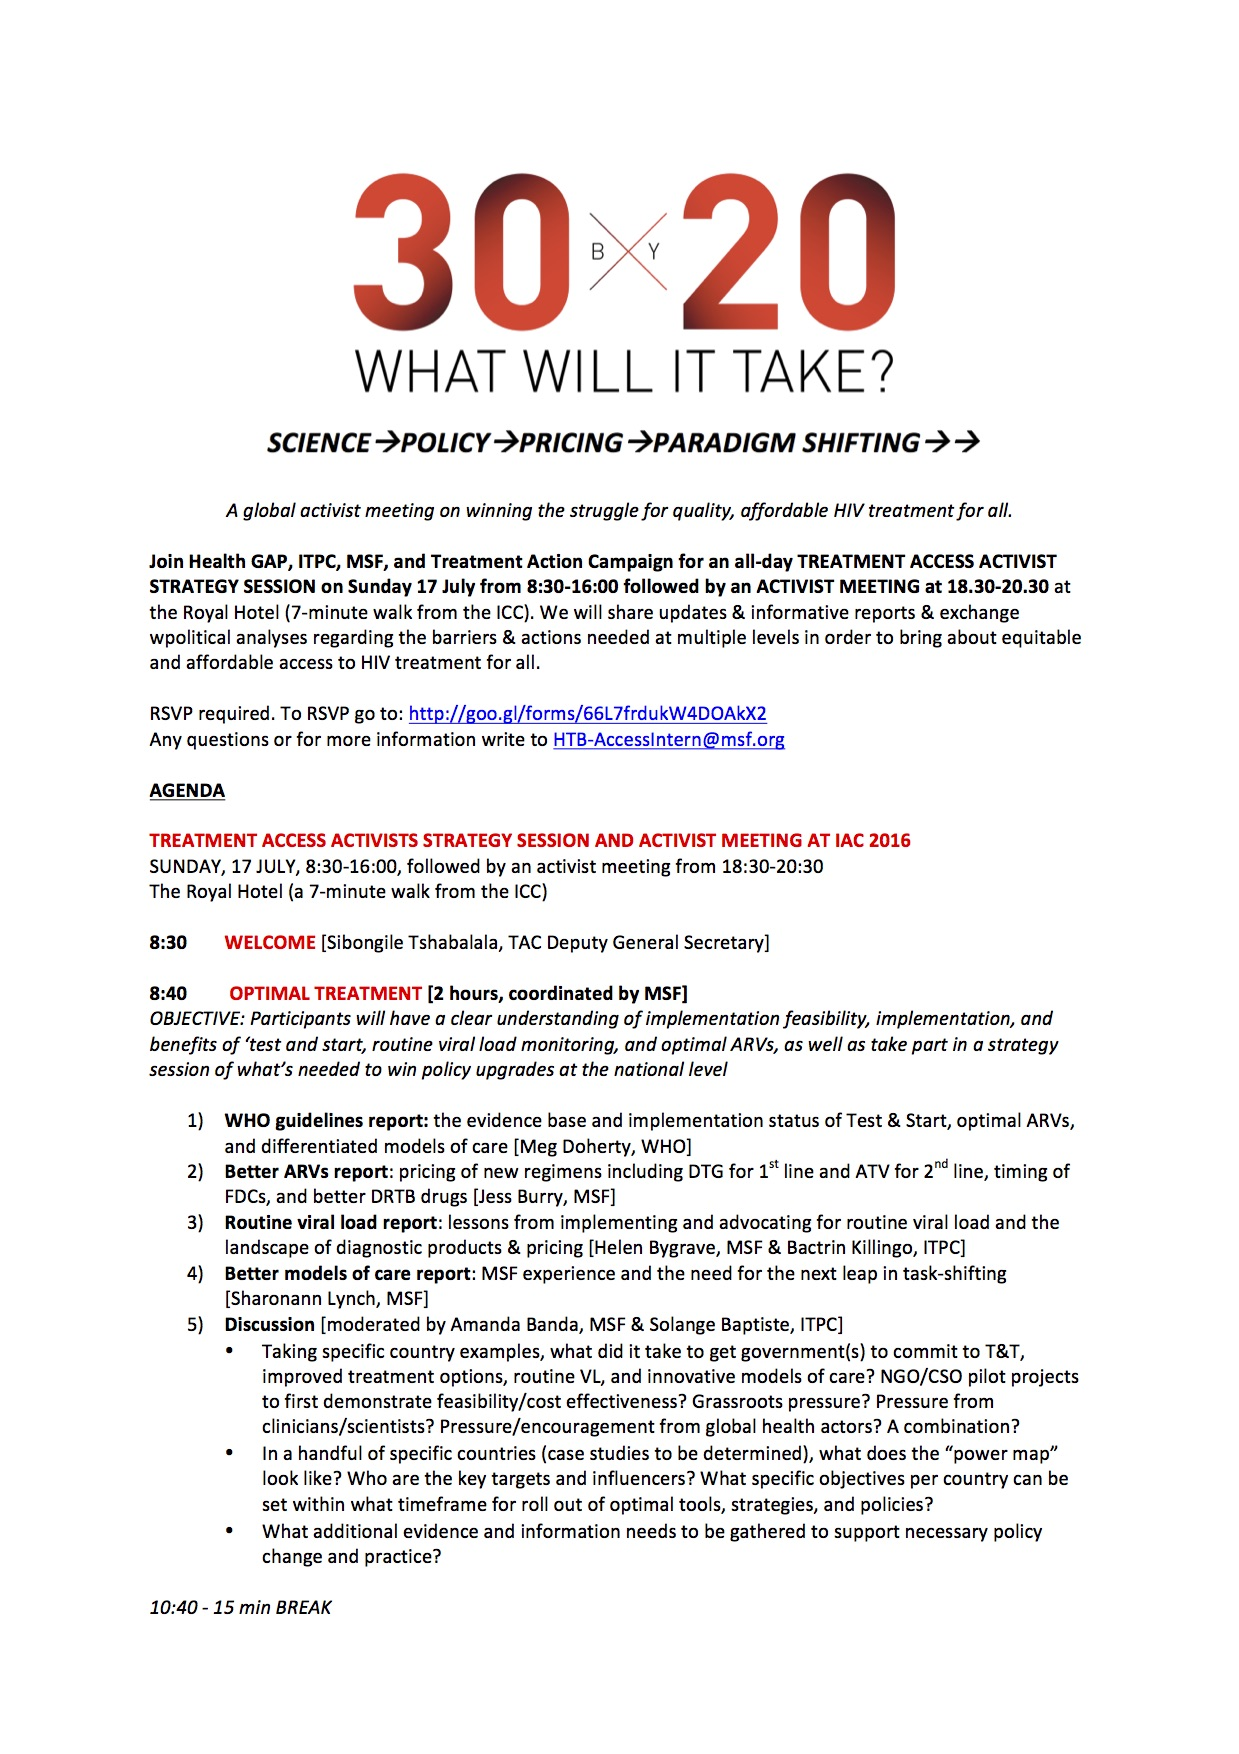 30x20_ACTIVIST_STRATEGY_AGENDA_(pg1).jpg